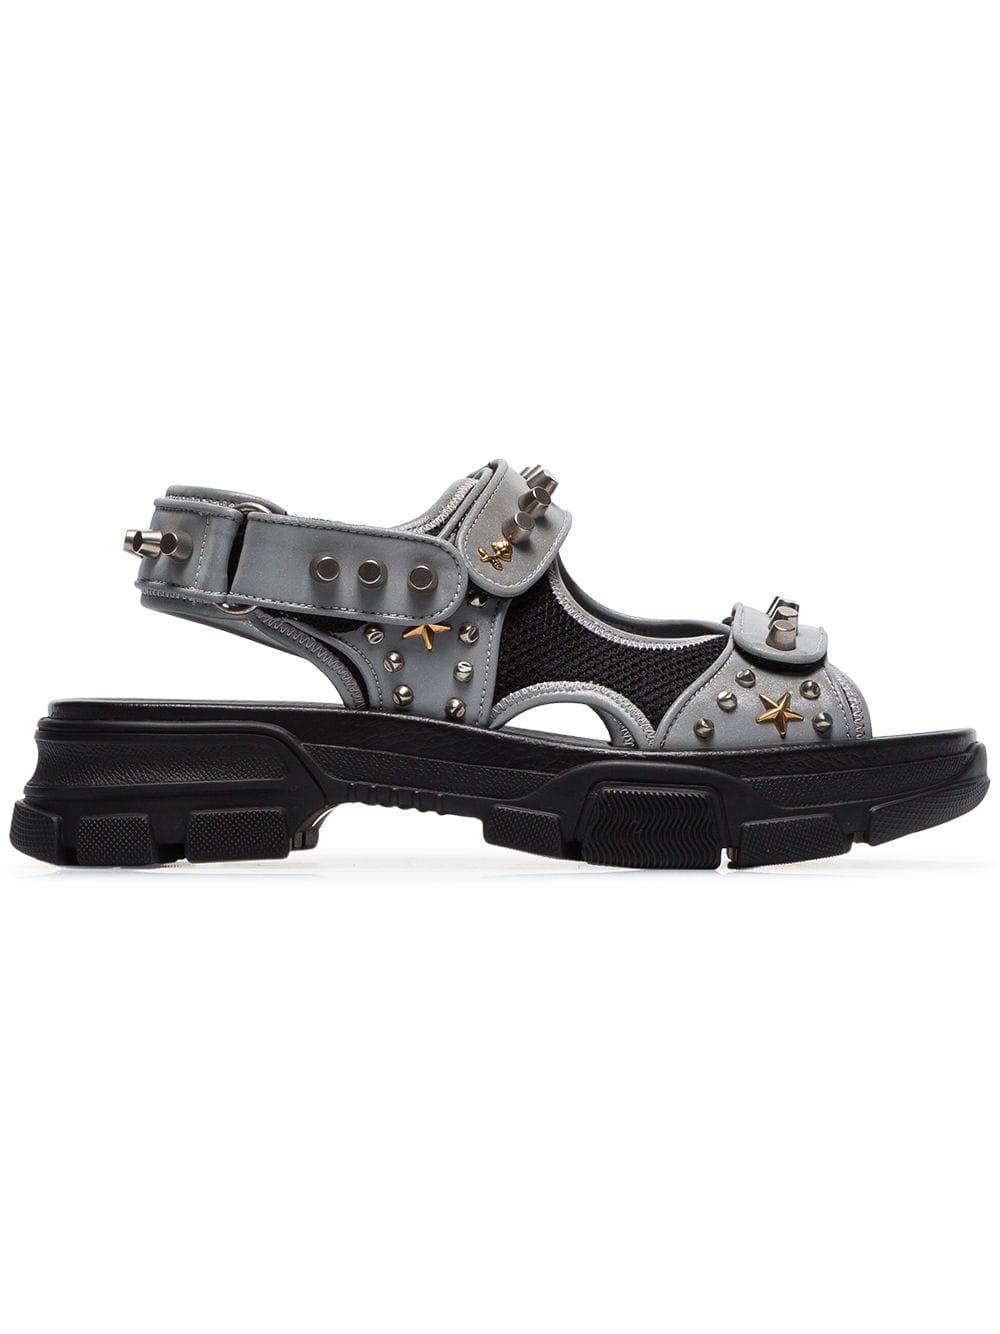 4bc242c98f2 Gucci - Stud Embellished Leather Sandals - Mens - Grey Multi